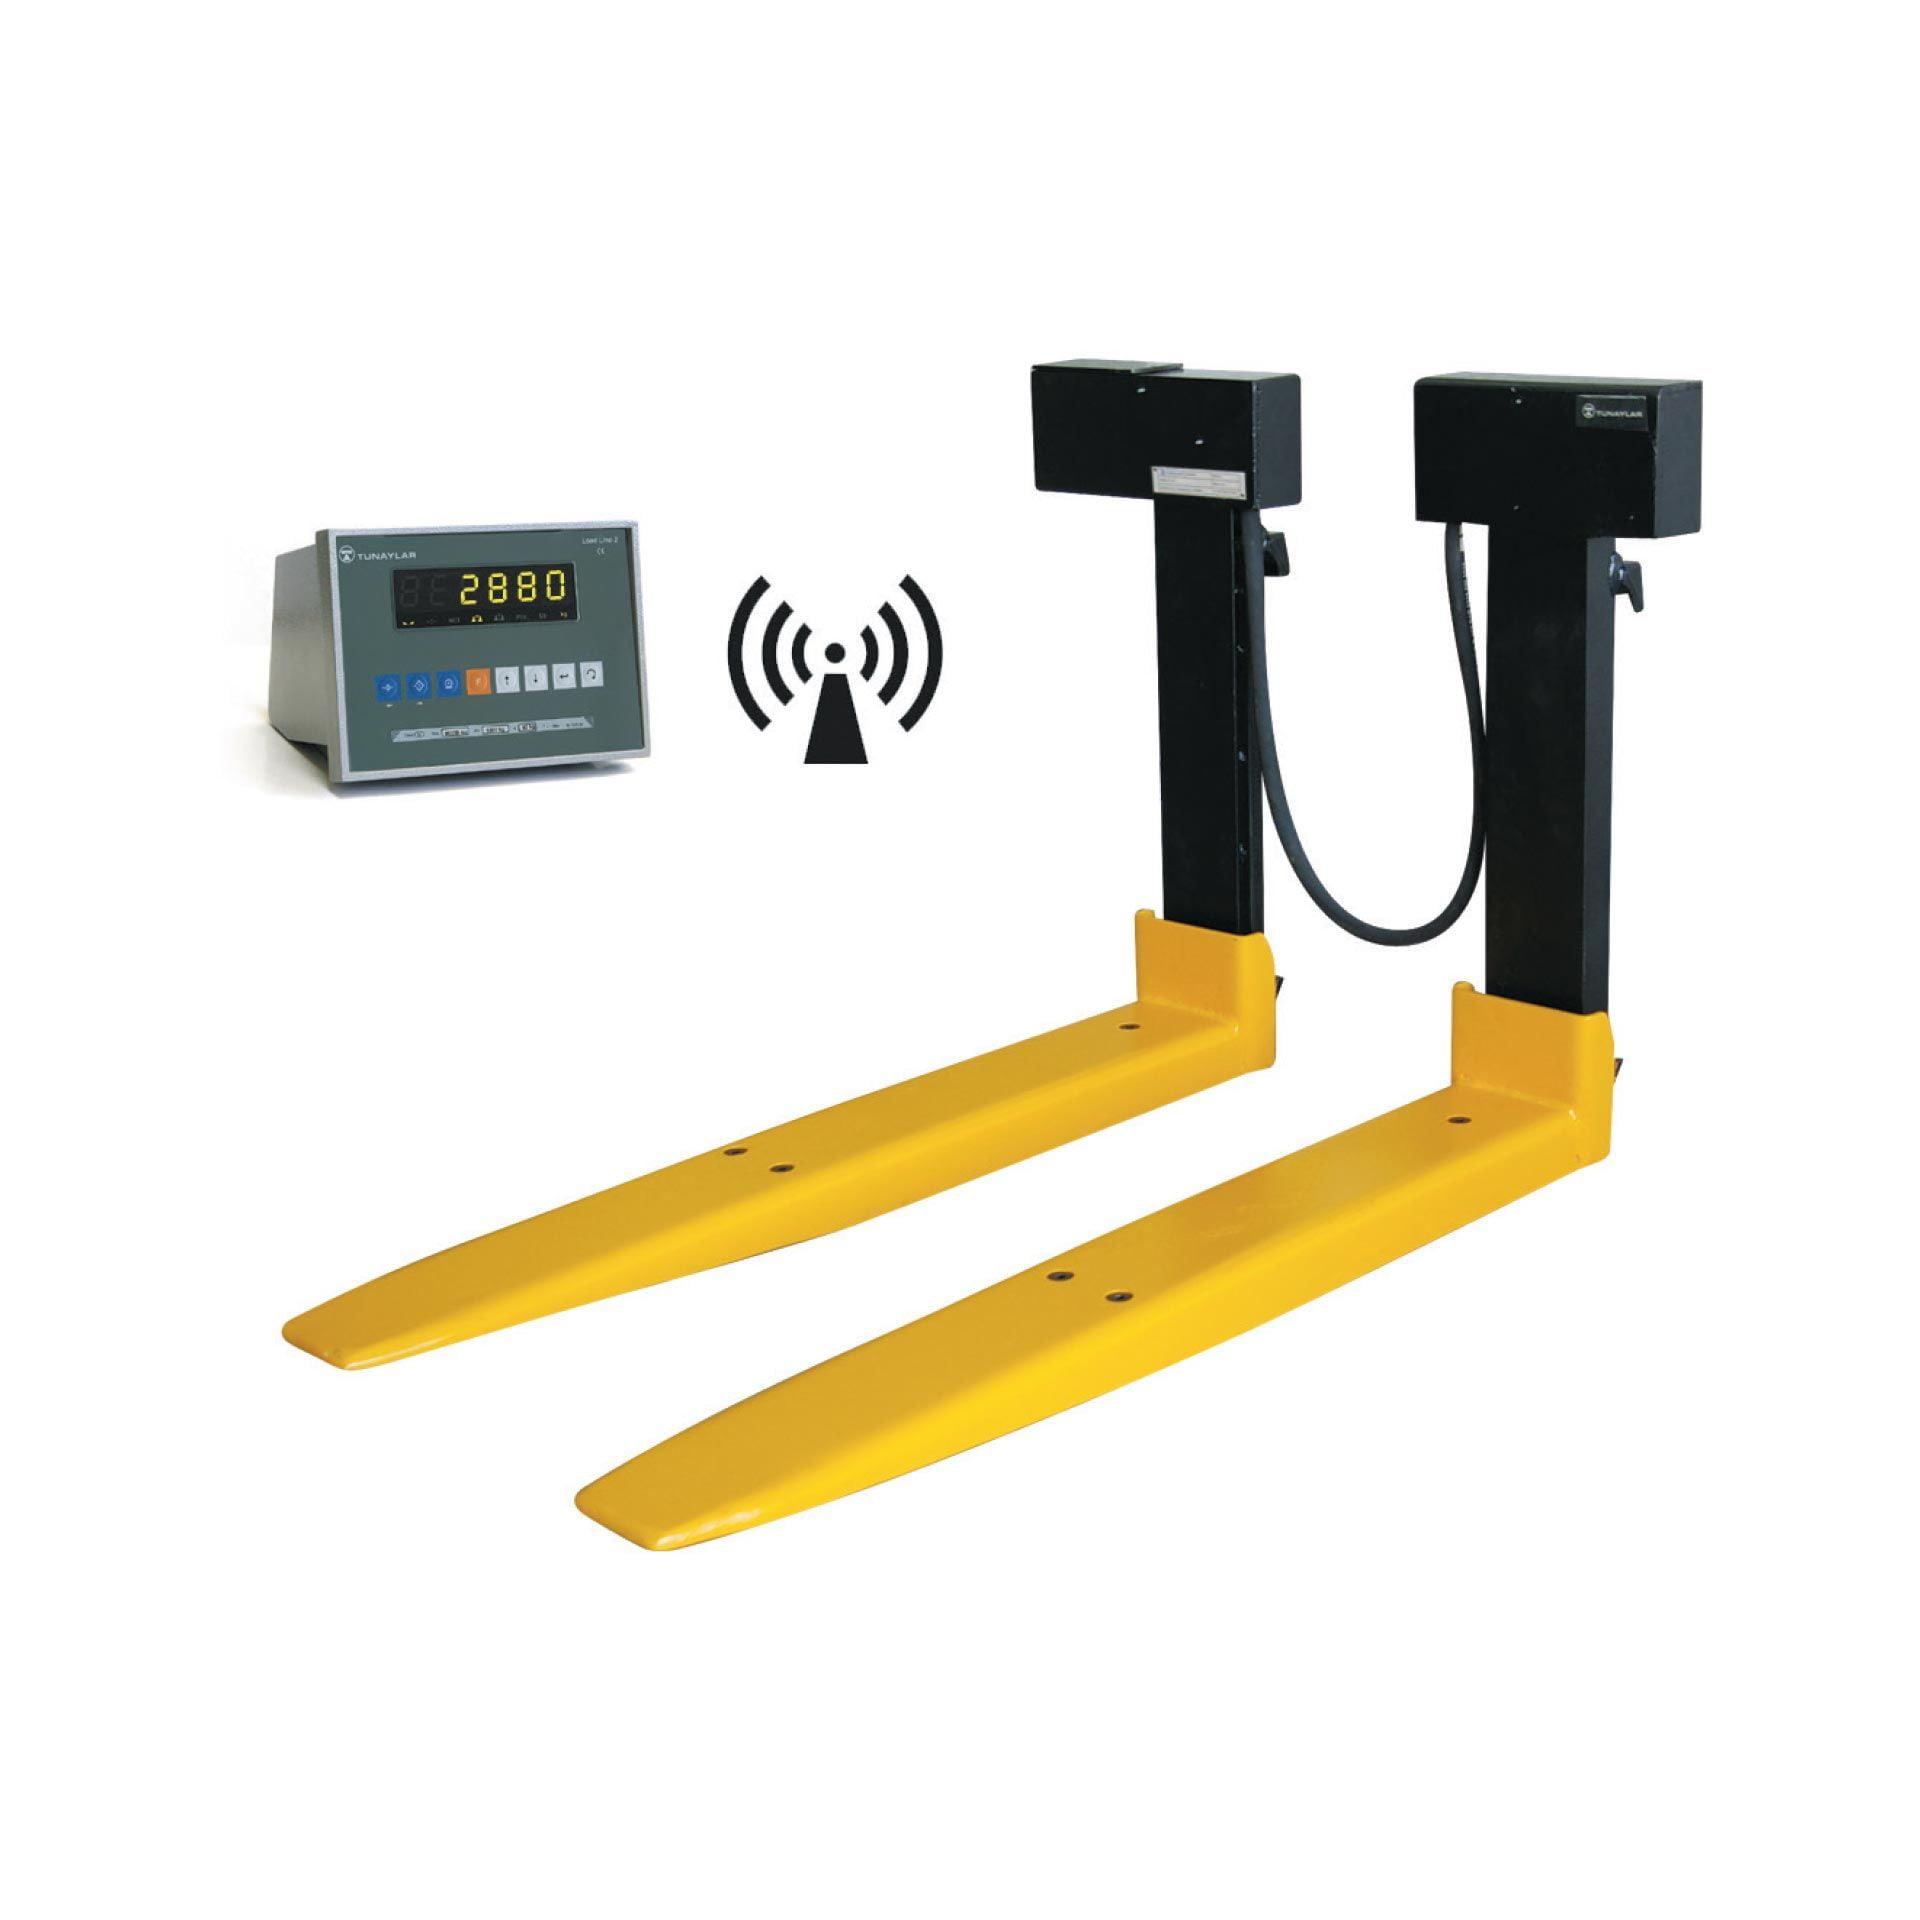 Mobil-Tartim-Sistemleri-Forklift-Tartim-Sistemleri